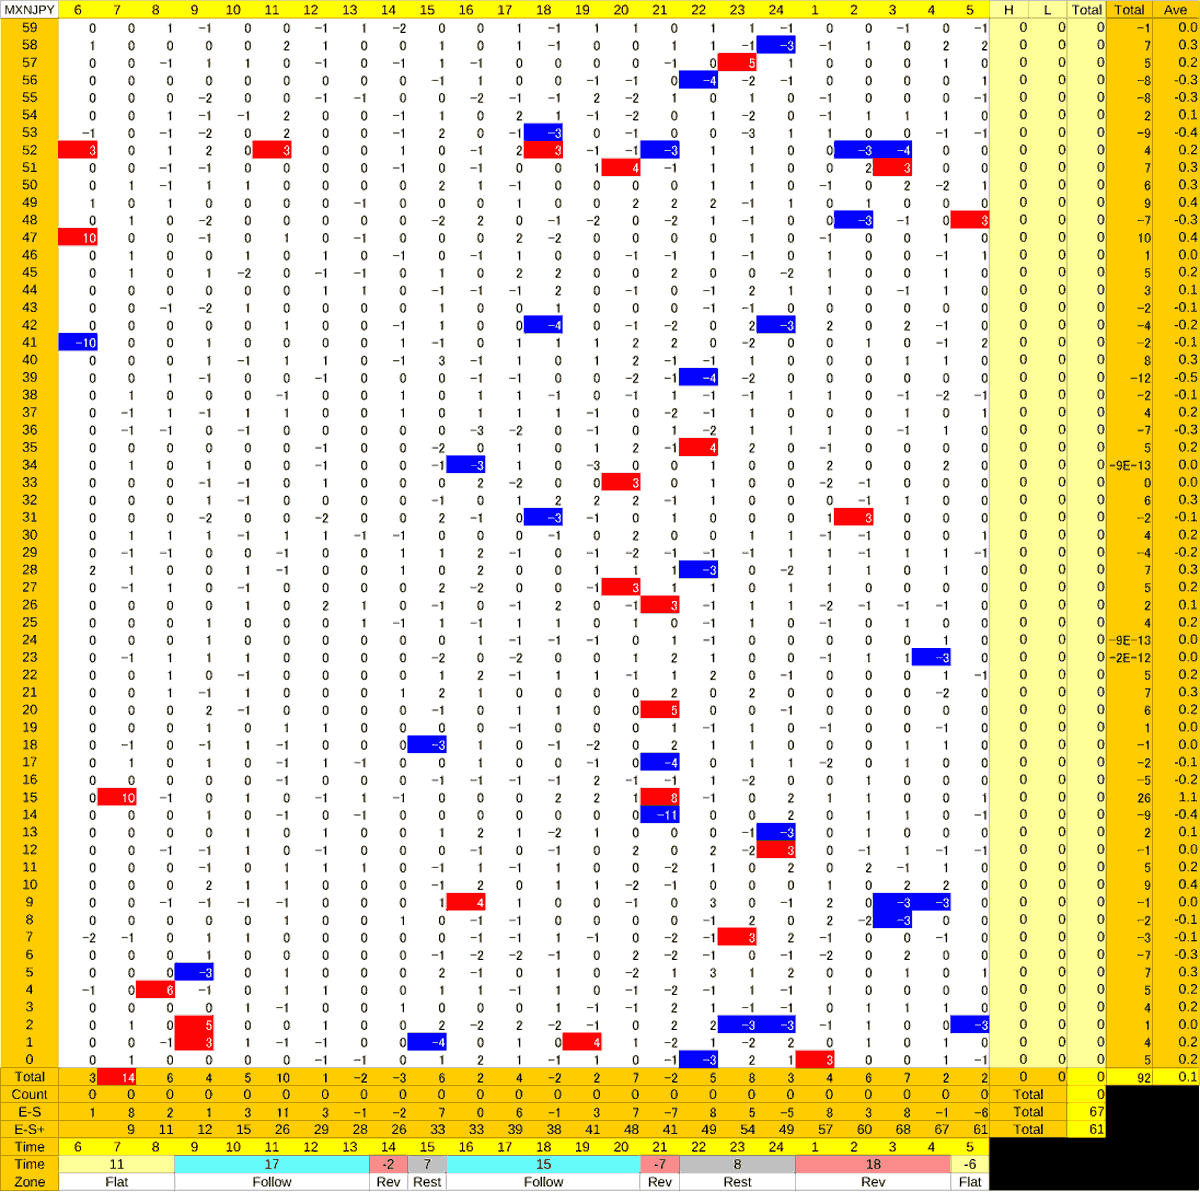 20200805_HS(3)MXNJPY